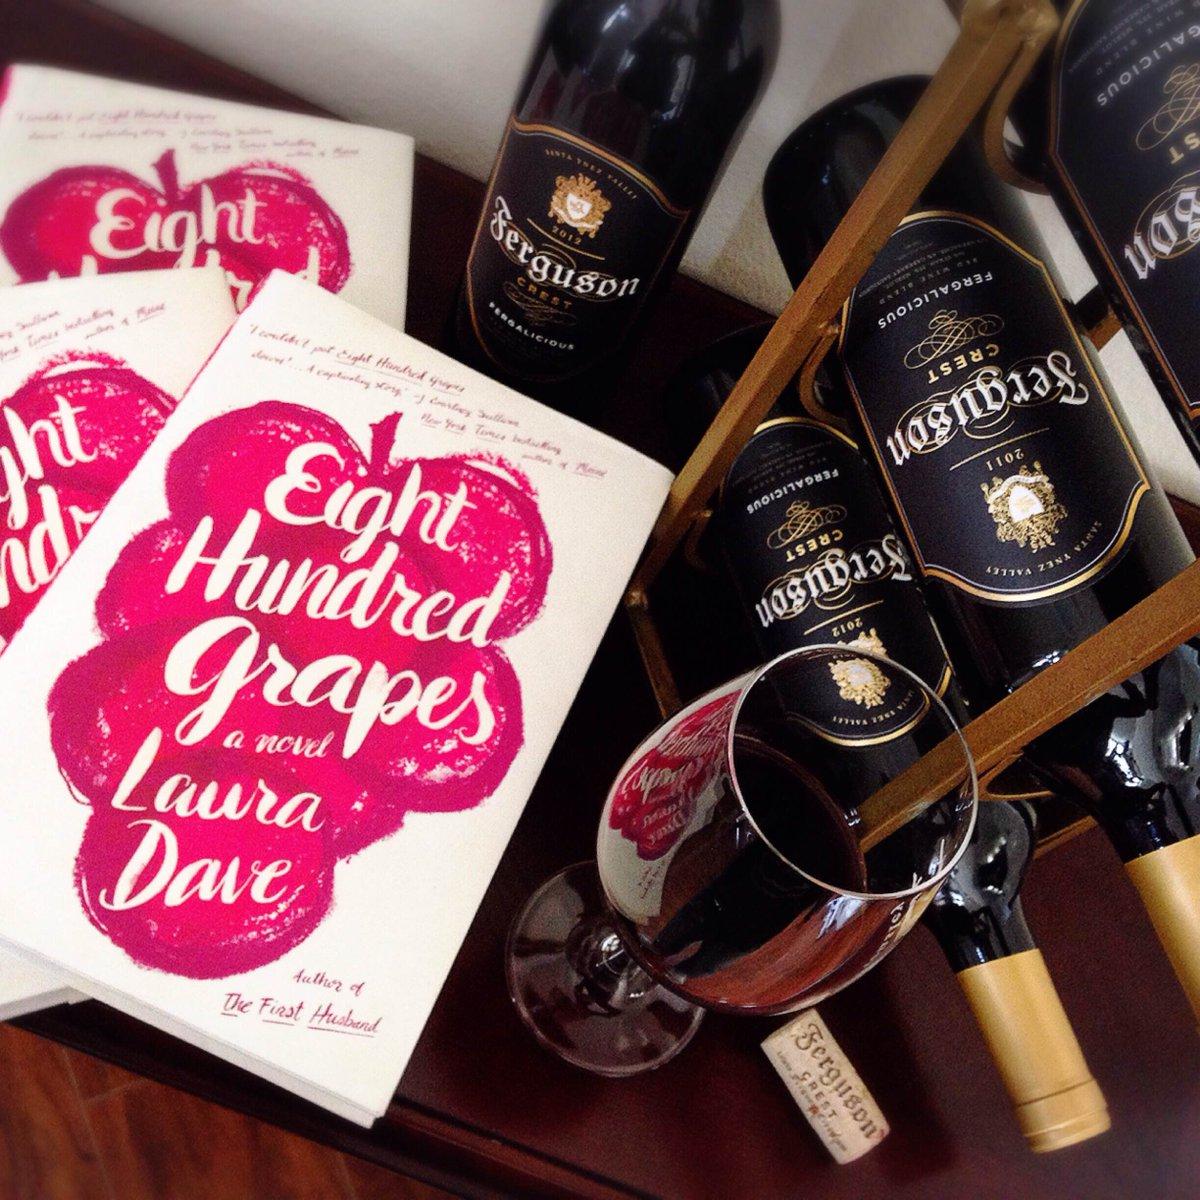 RT @FergusonCrest: My #bookclub can #read between the #wines.???????????? #worldbookday #wineclub #redwine #fergalicious https://t.co/qMyV254EPp htt…